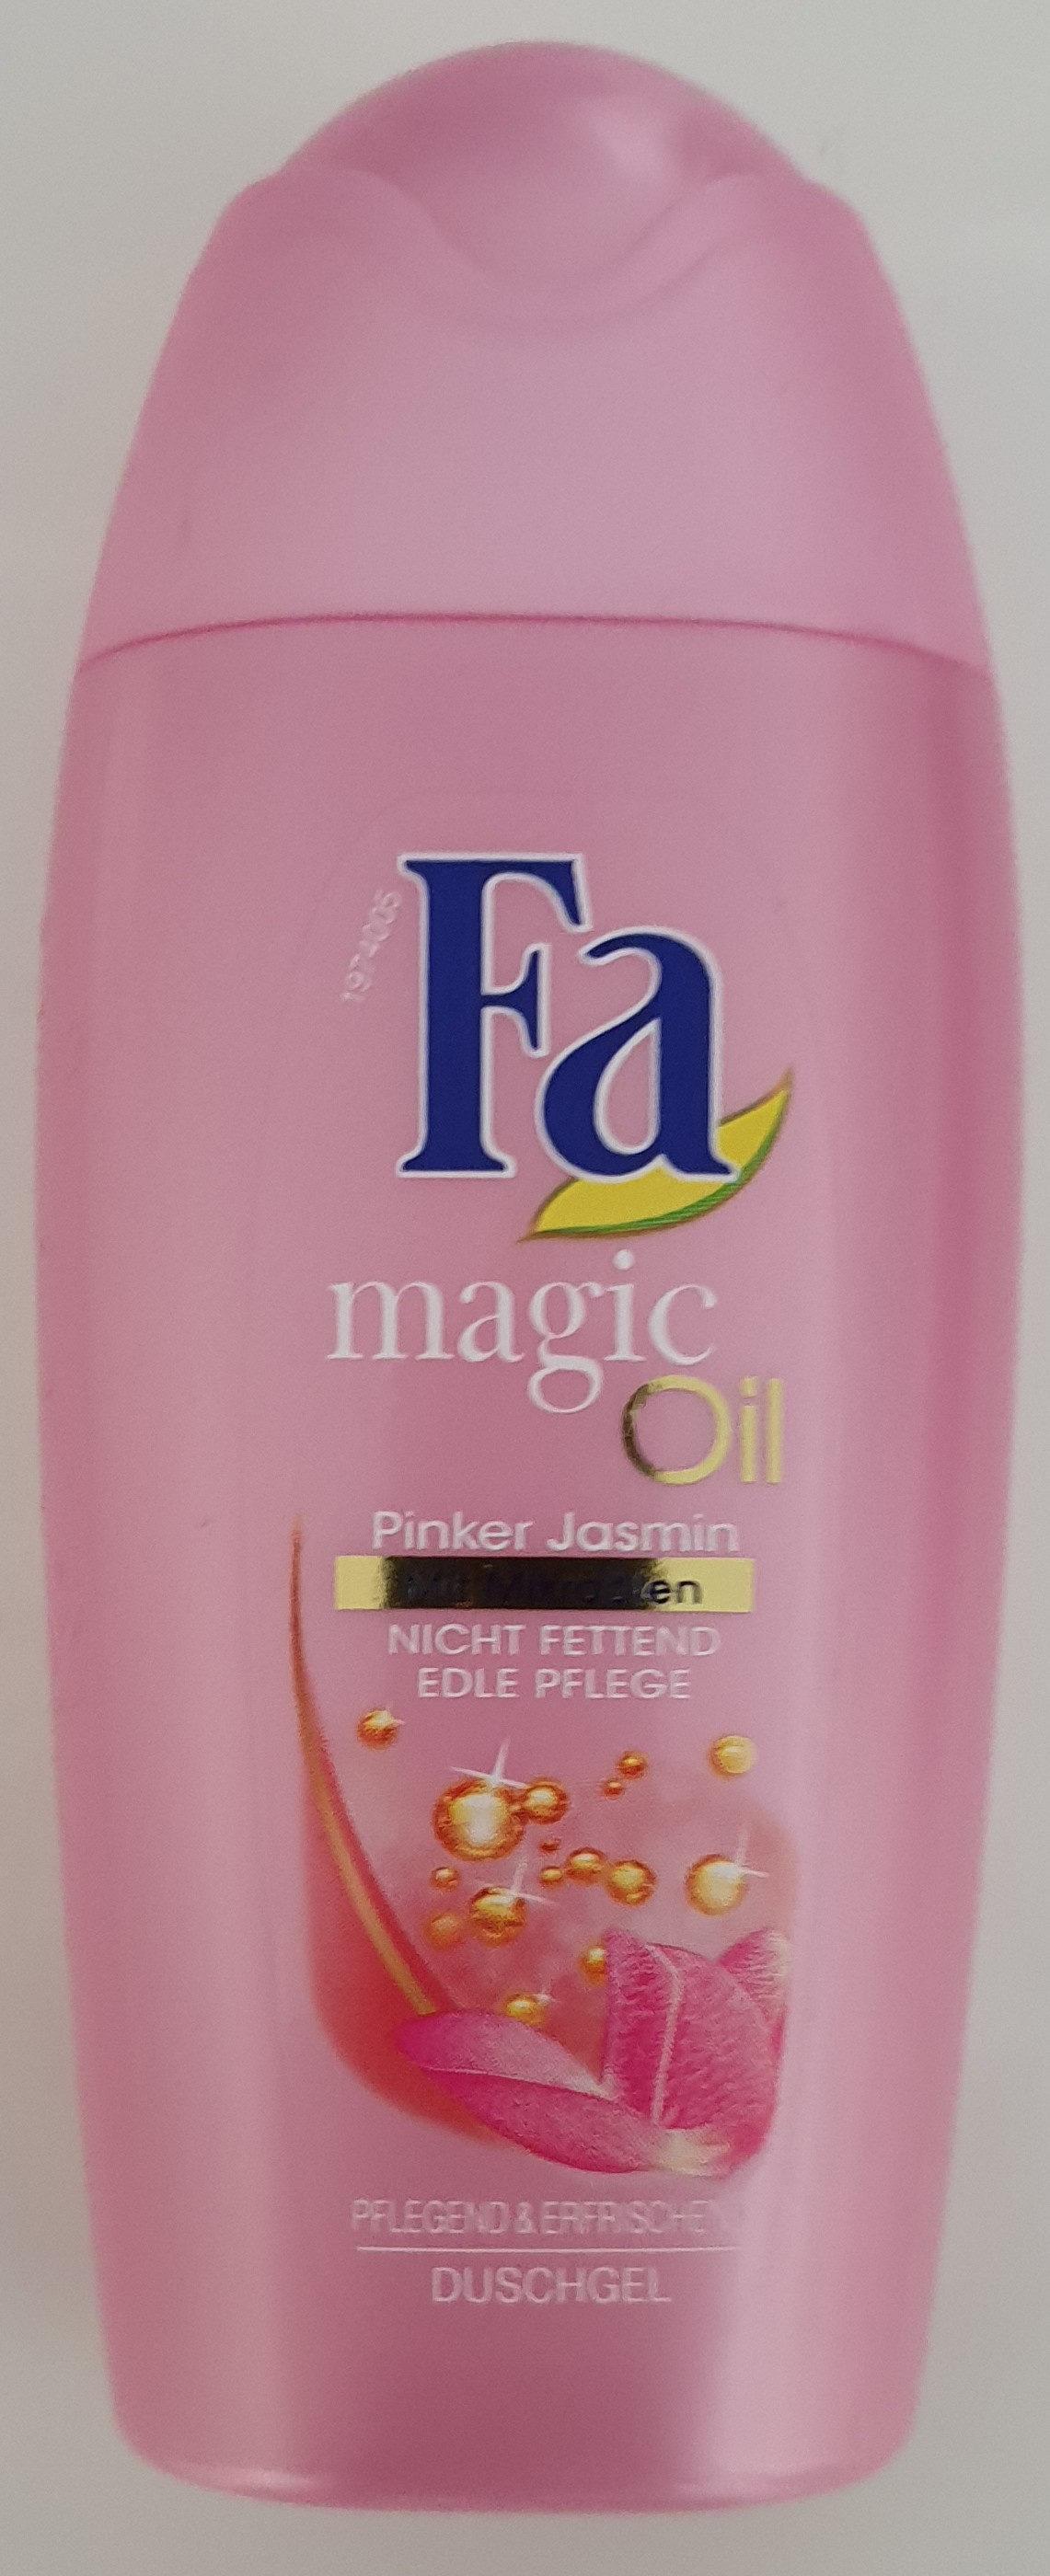 magic Oil Pinker Jasmin - Product